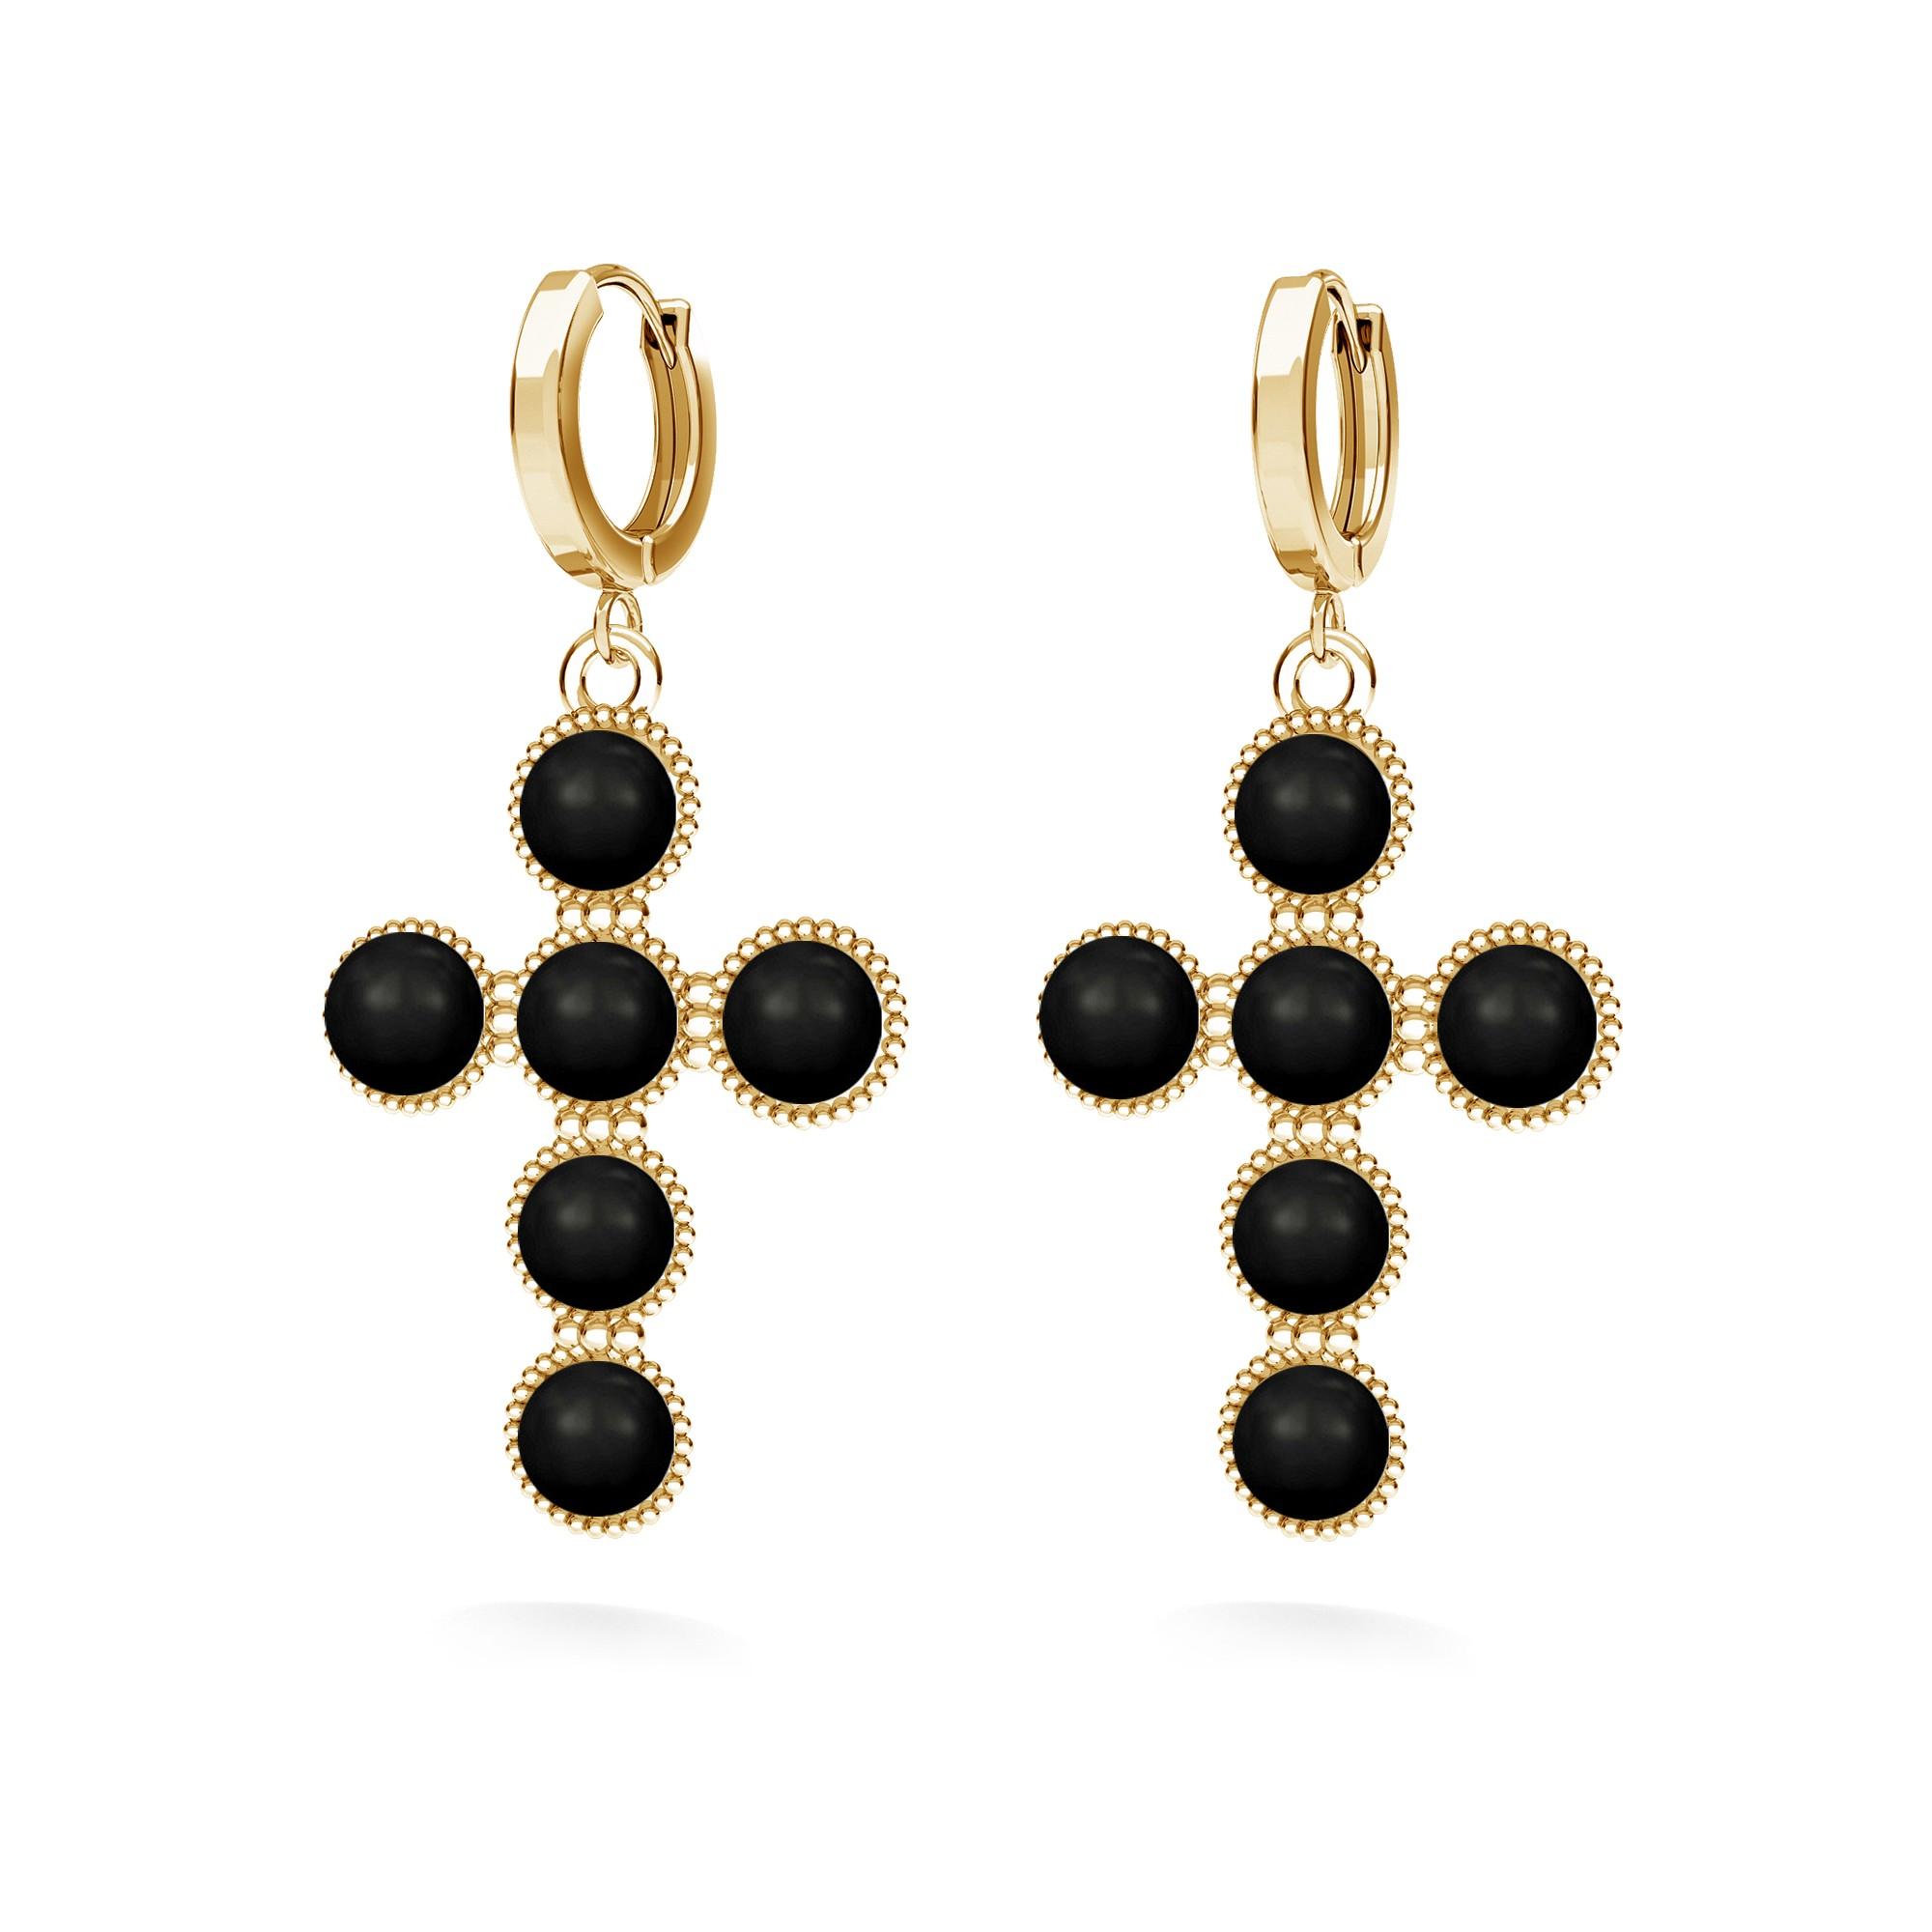 Cross earrings with Swarovski pearls, silver 925 & swarovski